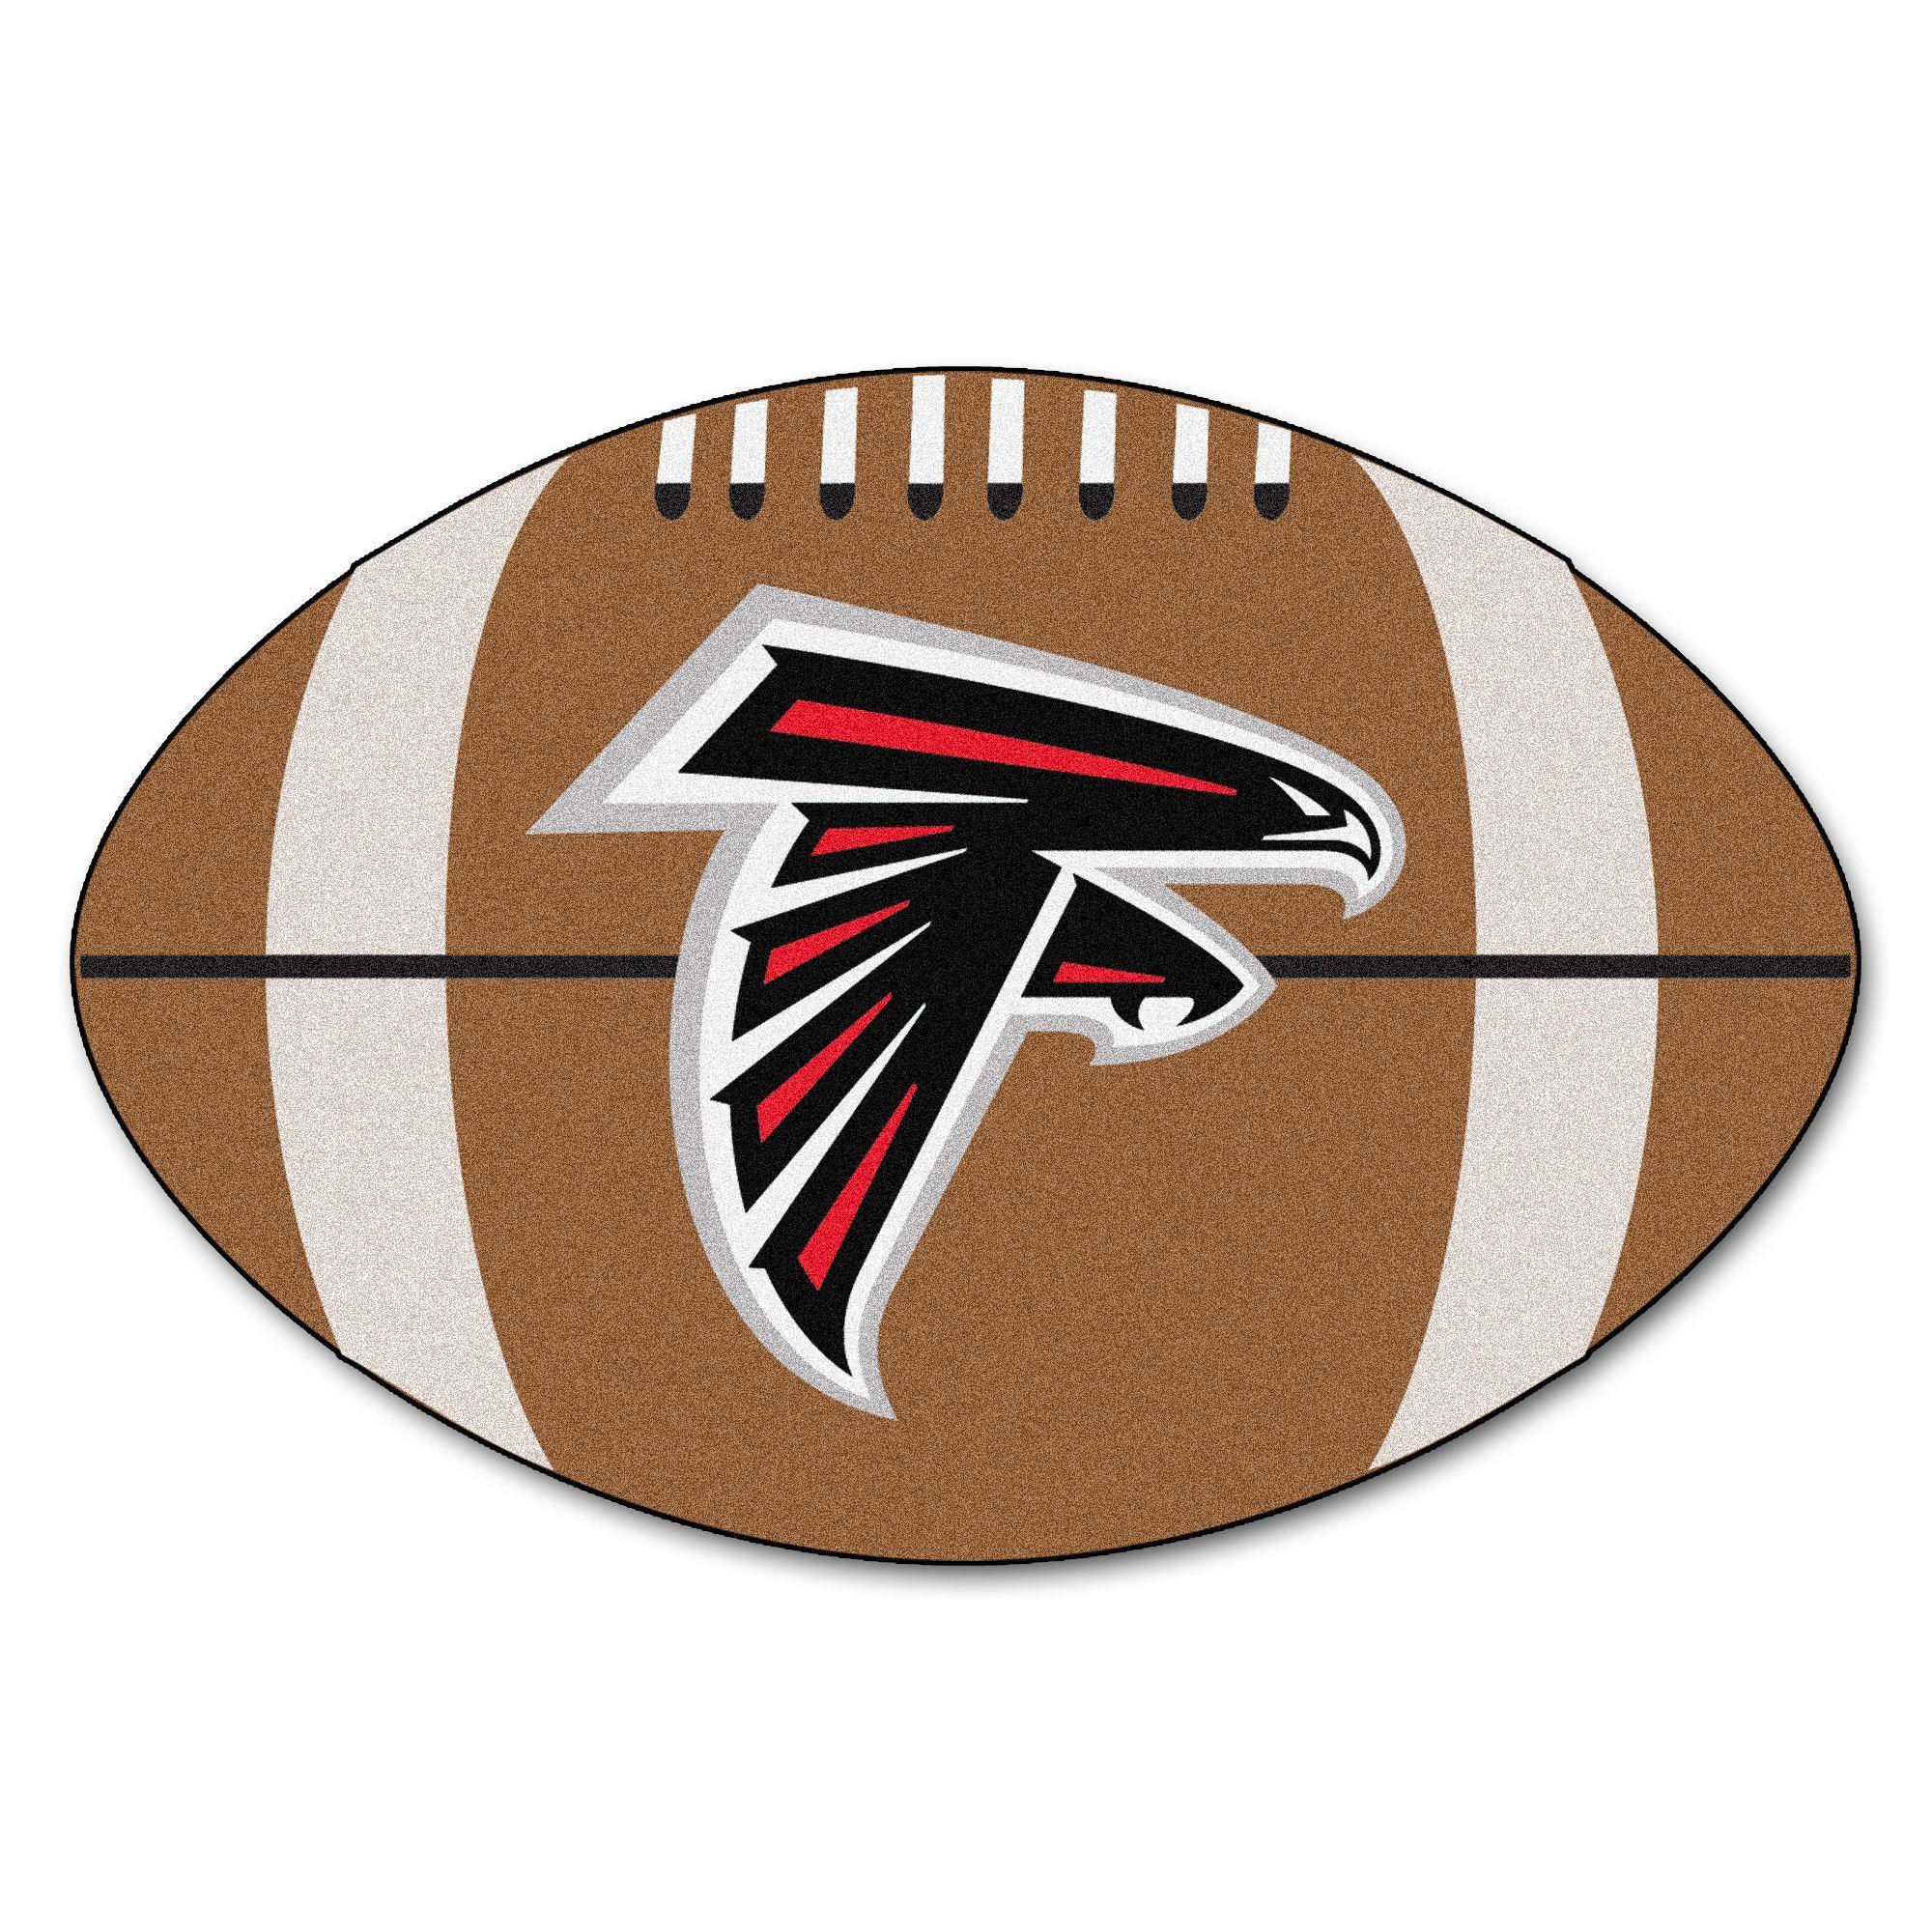 Football Rug 22 X 35 Atlanta Falcons Atlanta Falcons Football Falcons Football Football Rug